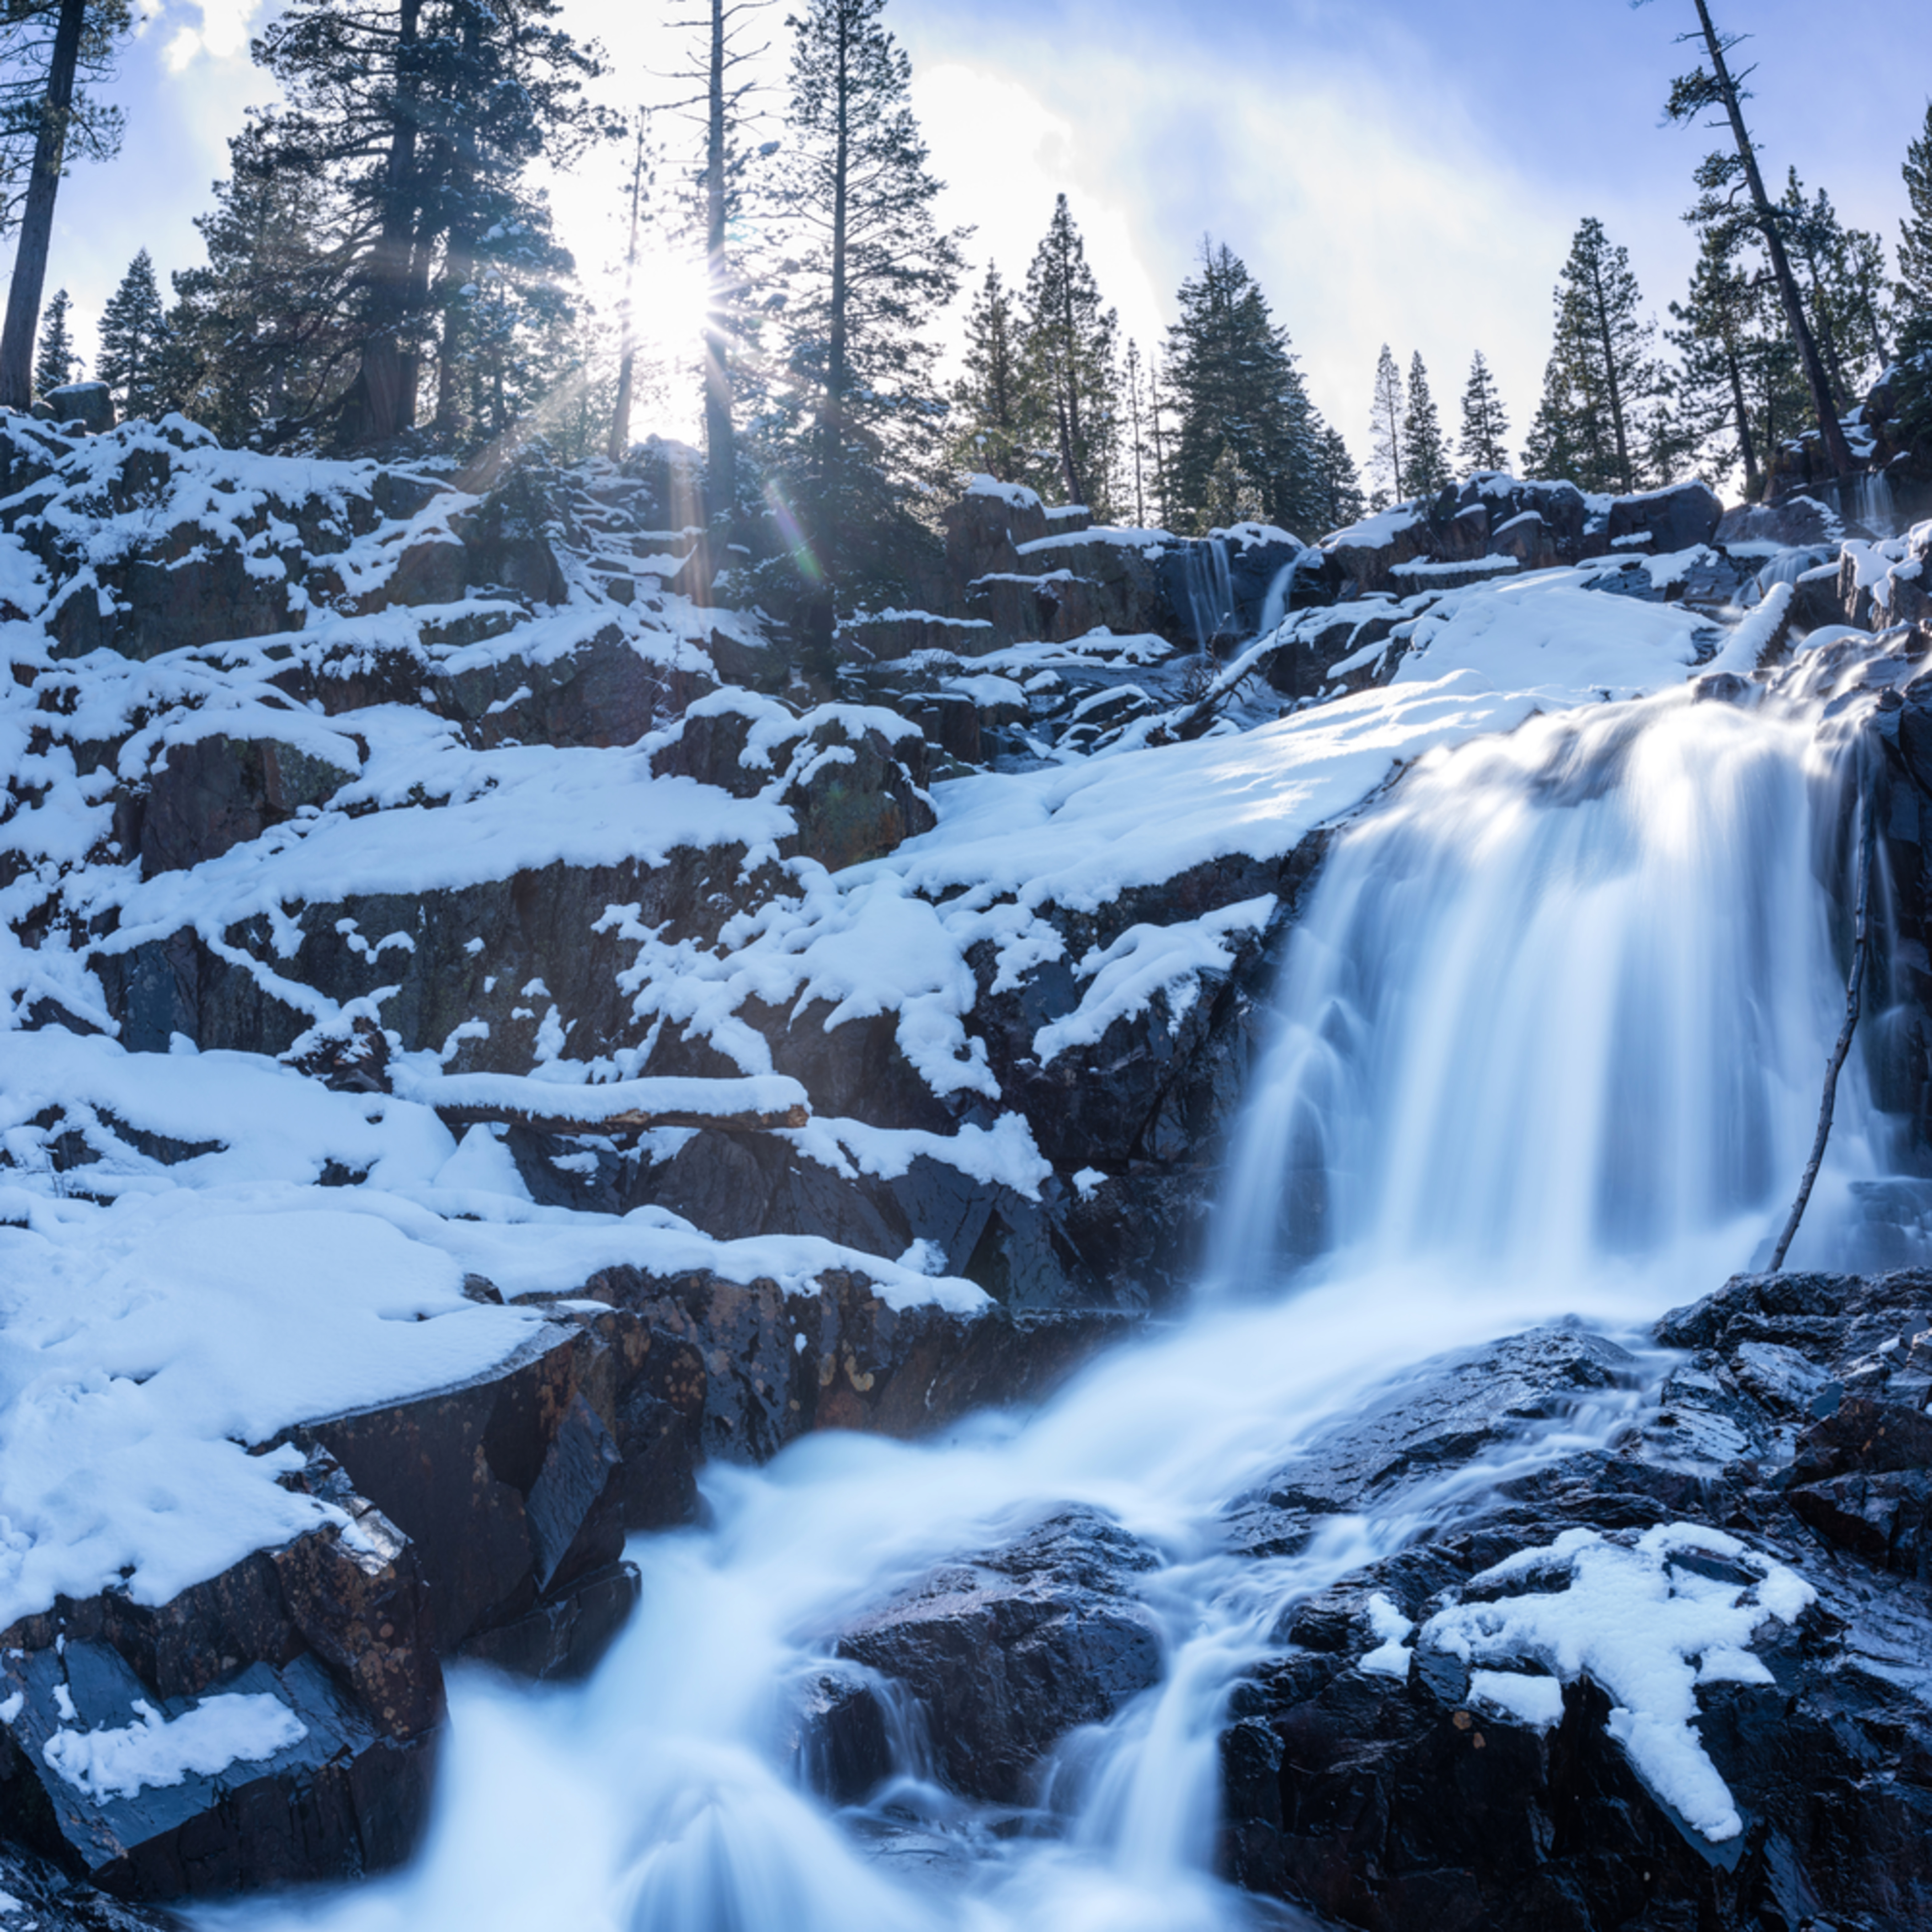 Glen alpine falls winter verticle pano tnnvk9